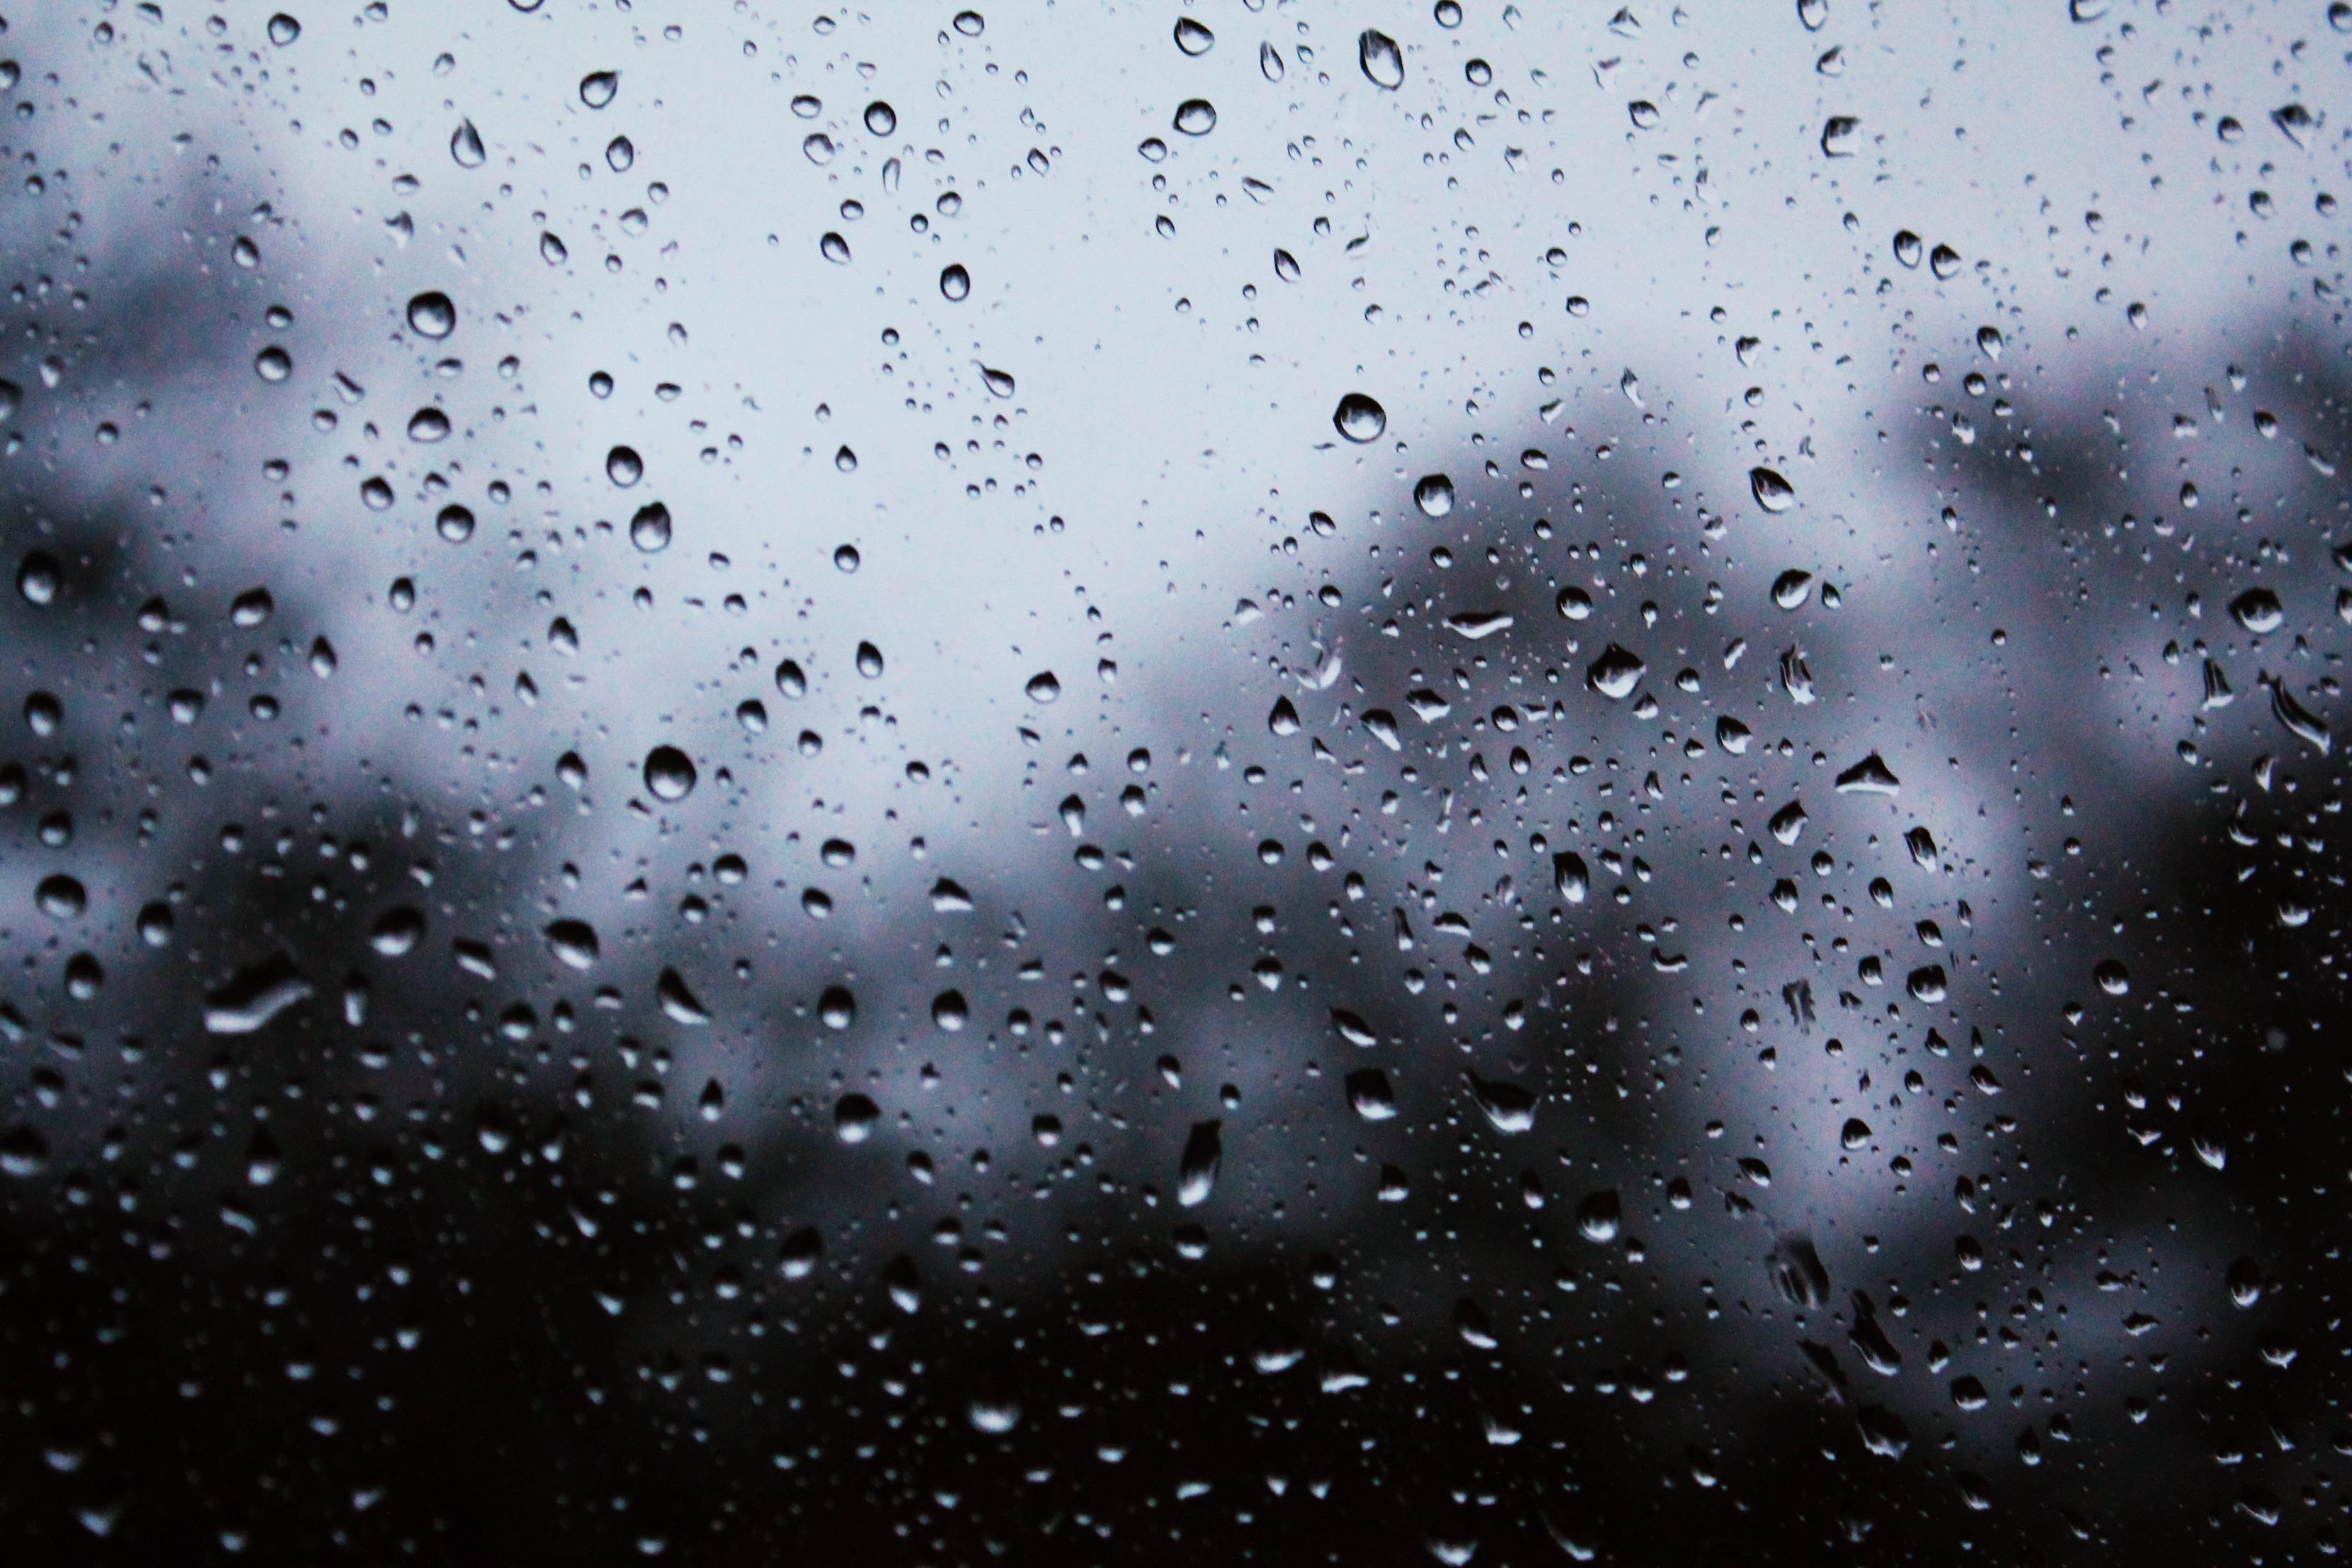 3318x2212 > Raindrops Wallpapers